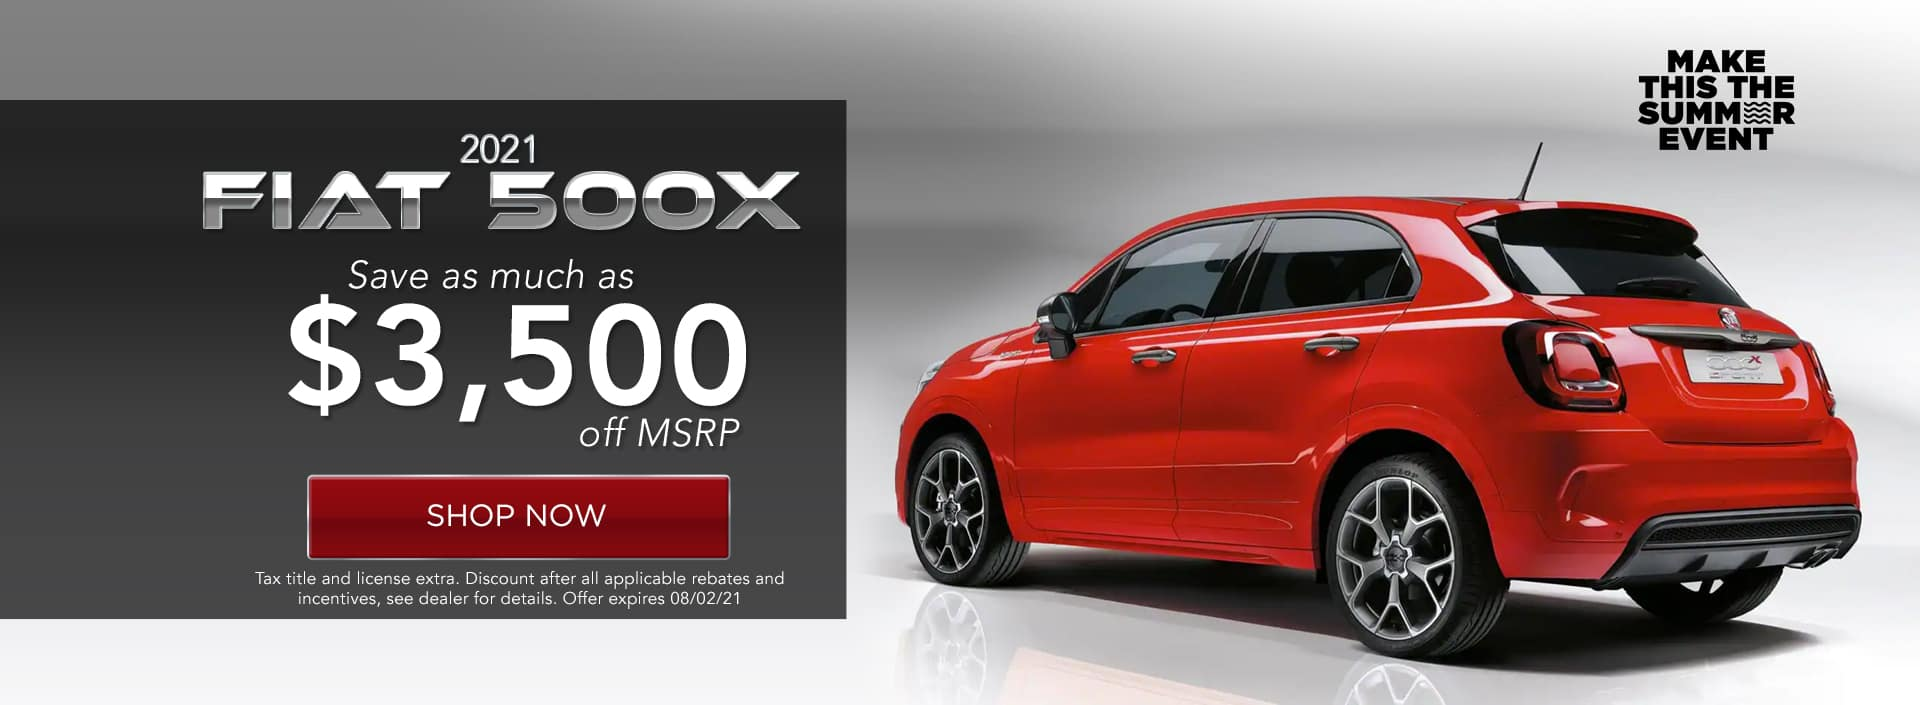 500x_offer